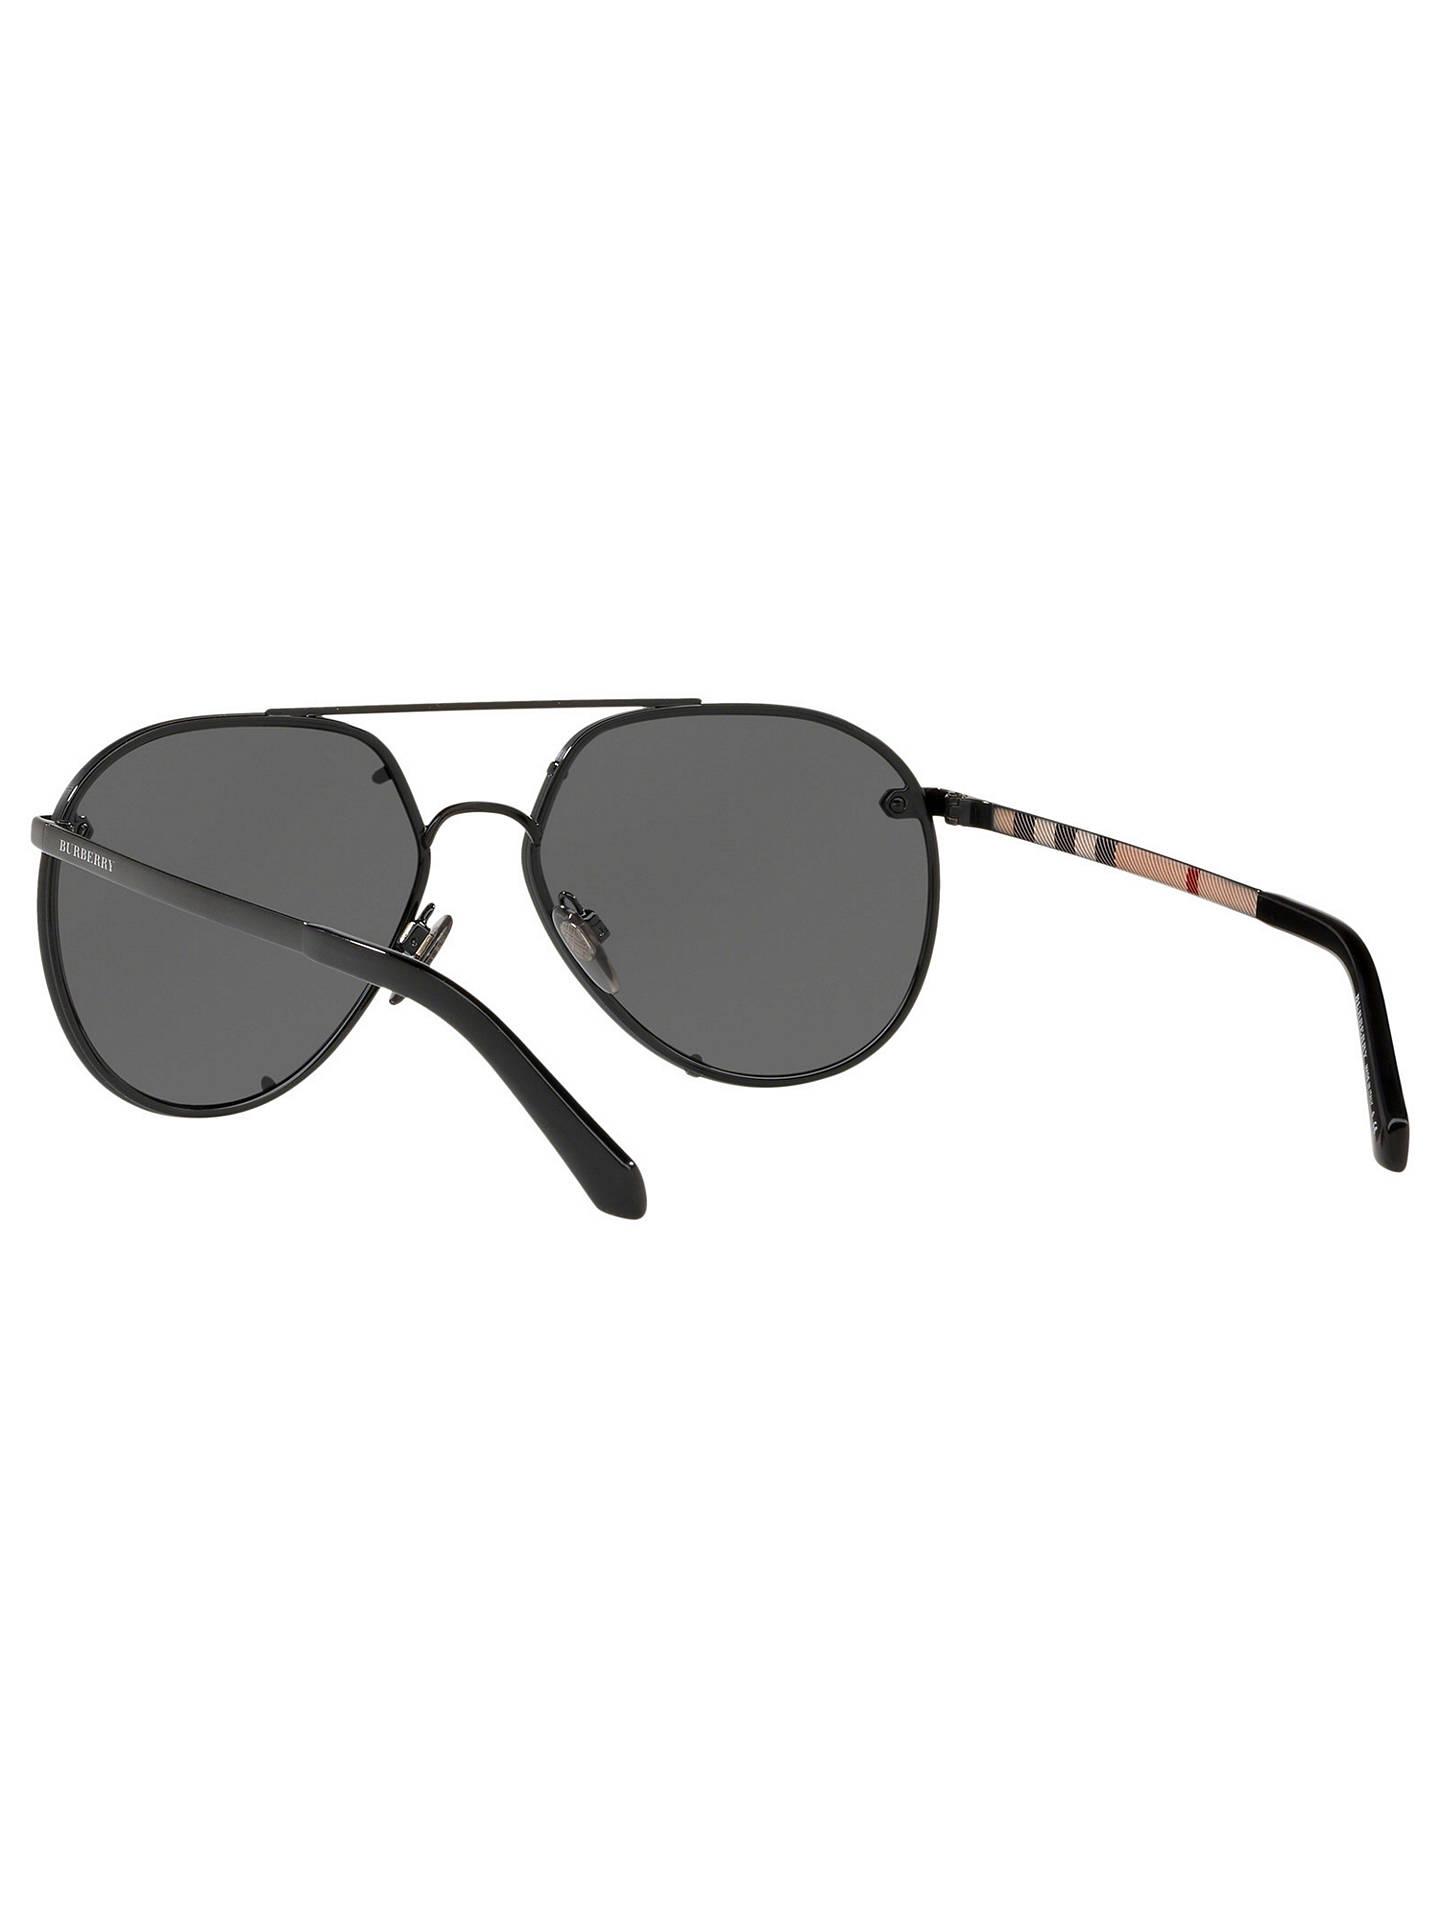 3e7b13299d Burberry BE3099 Women s Aviator Sunglasses at John Lewis   Partners